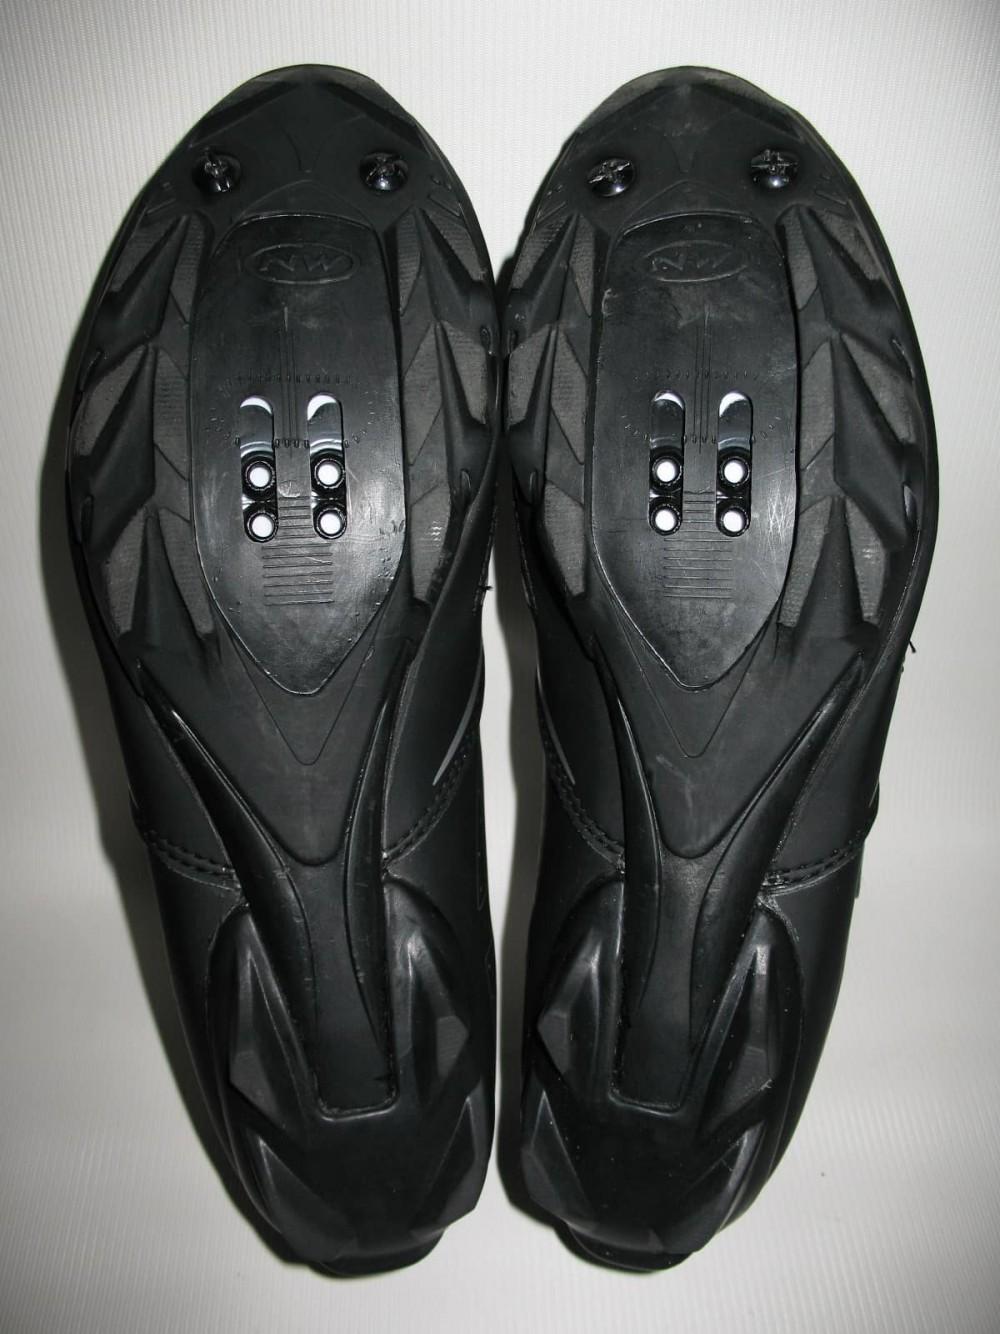 Велотуфли NORTHWAVE elisir evo cyclng shoes (размер UK7.5/US8.5/EU41(на стопу до 265 mm)) - 7